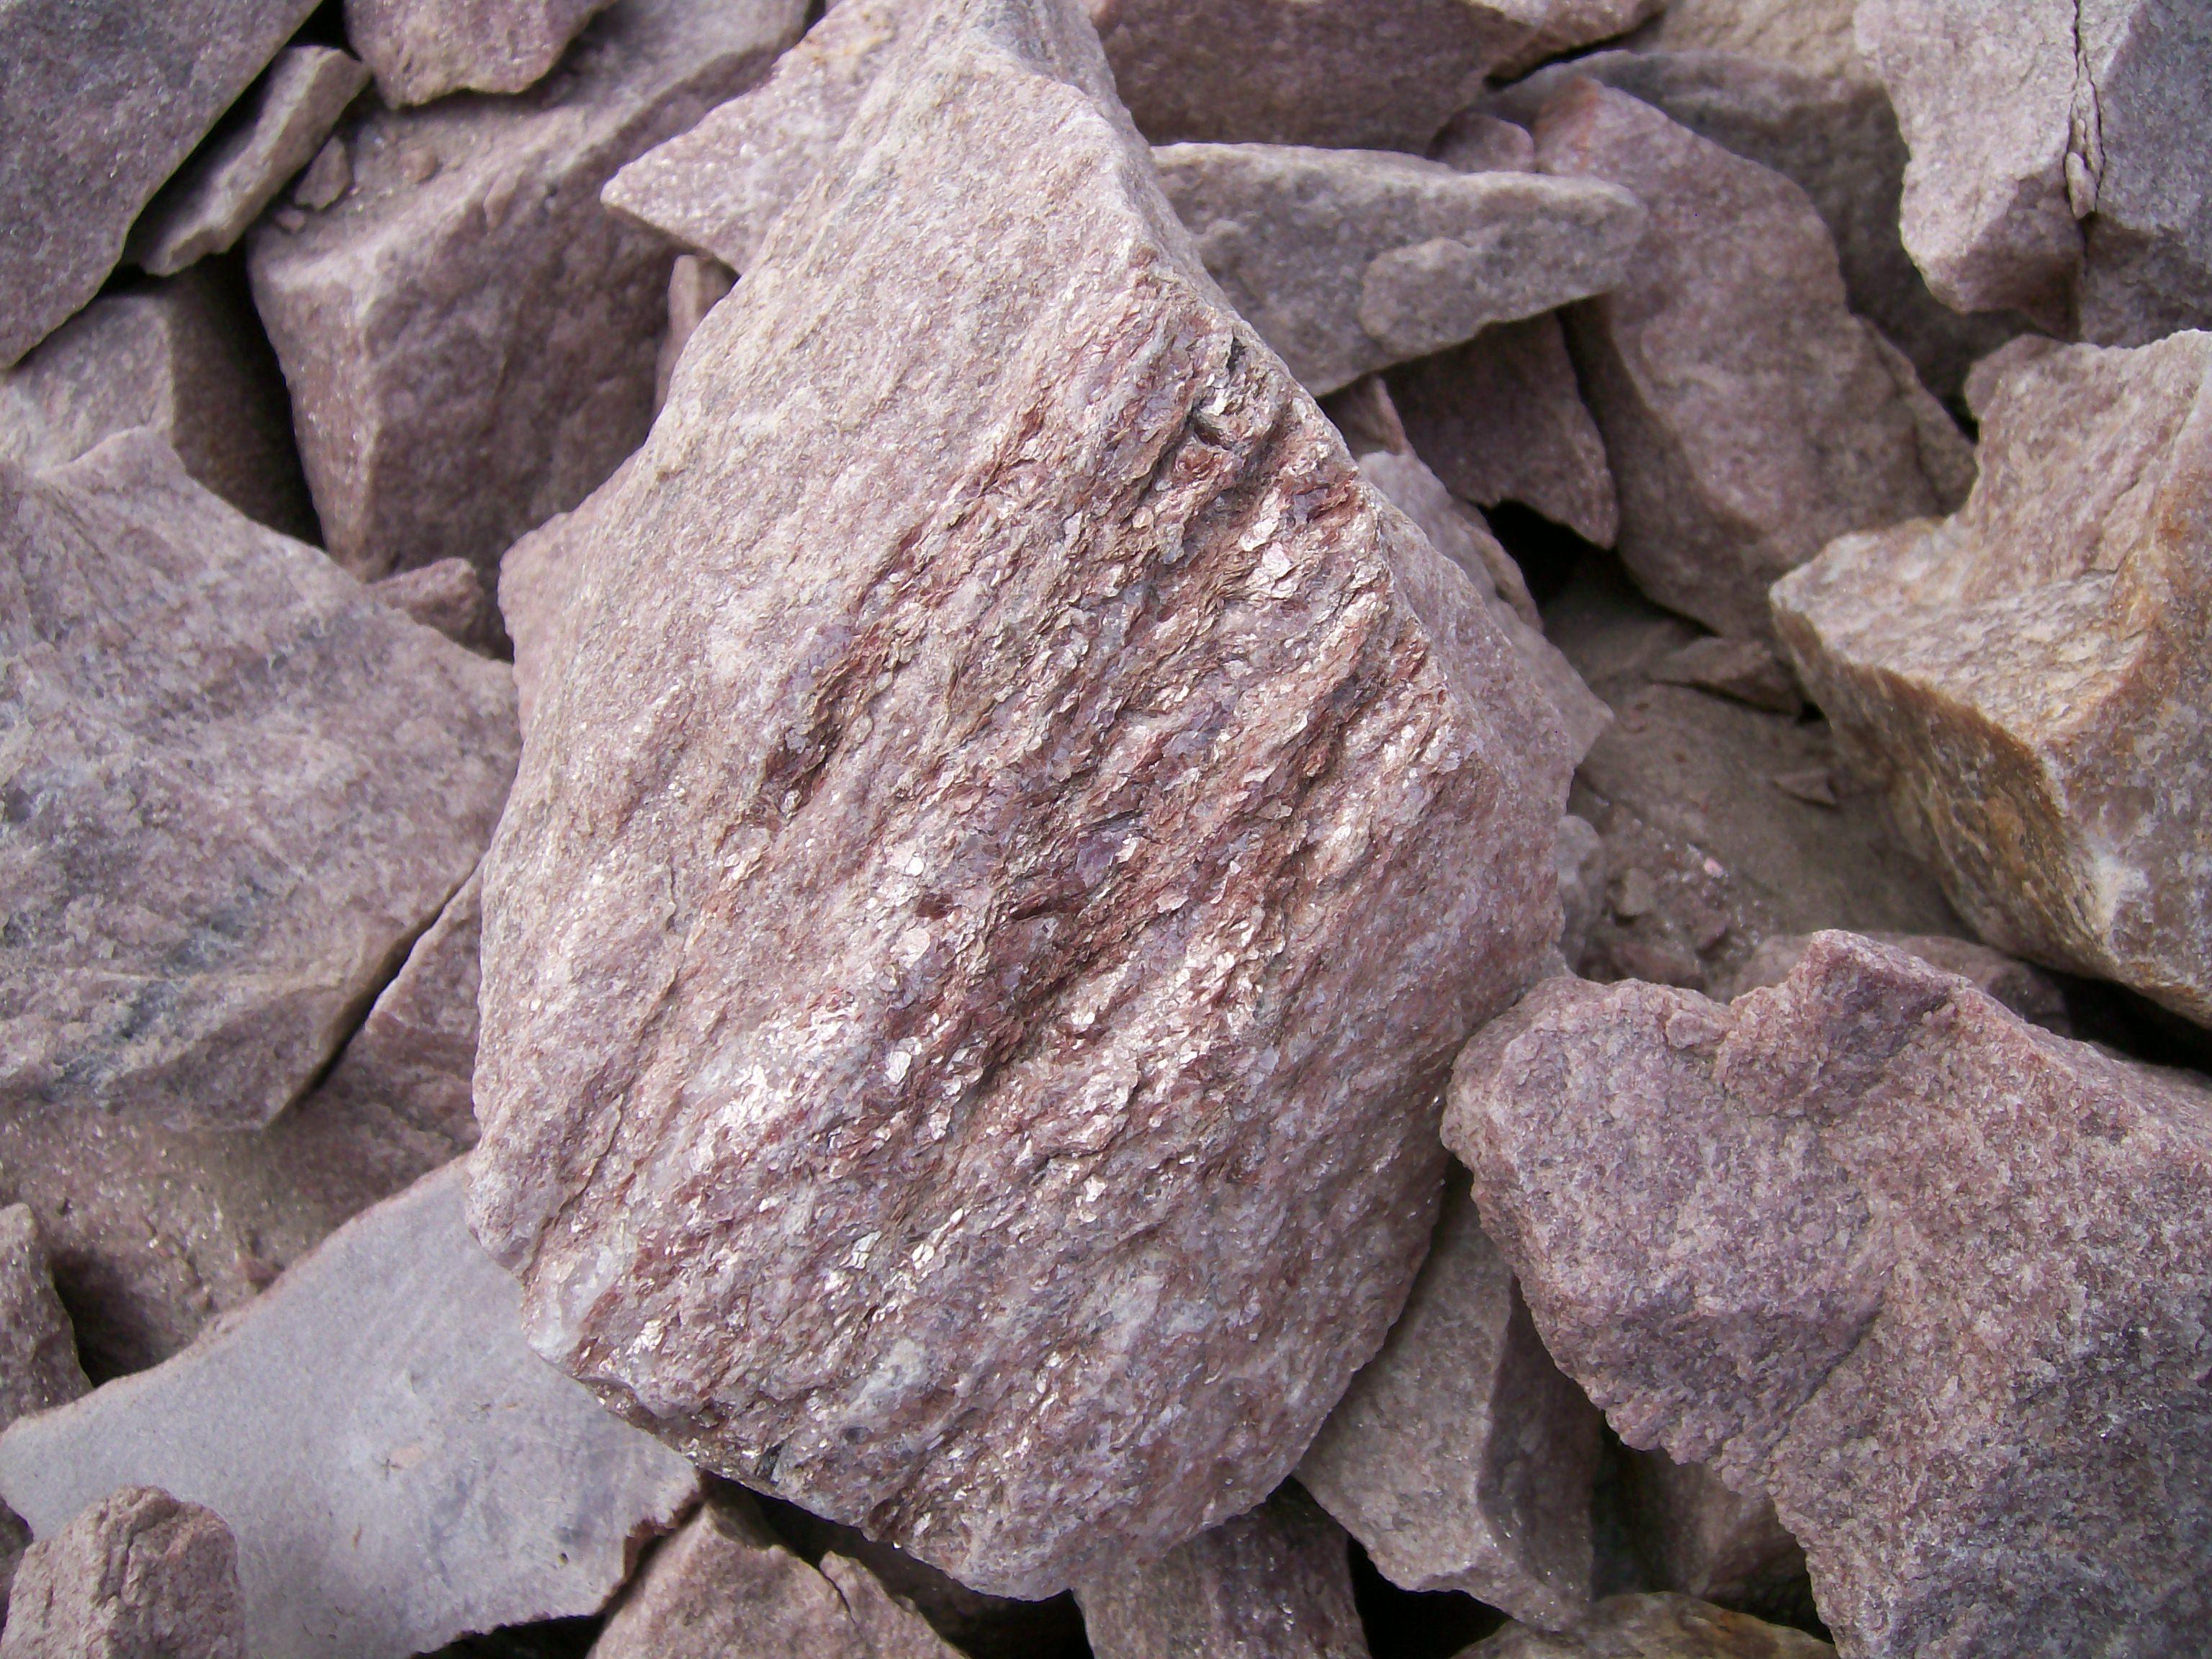 Polished Rocks Stones Dakota Stone S Rock Shop Hill City